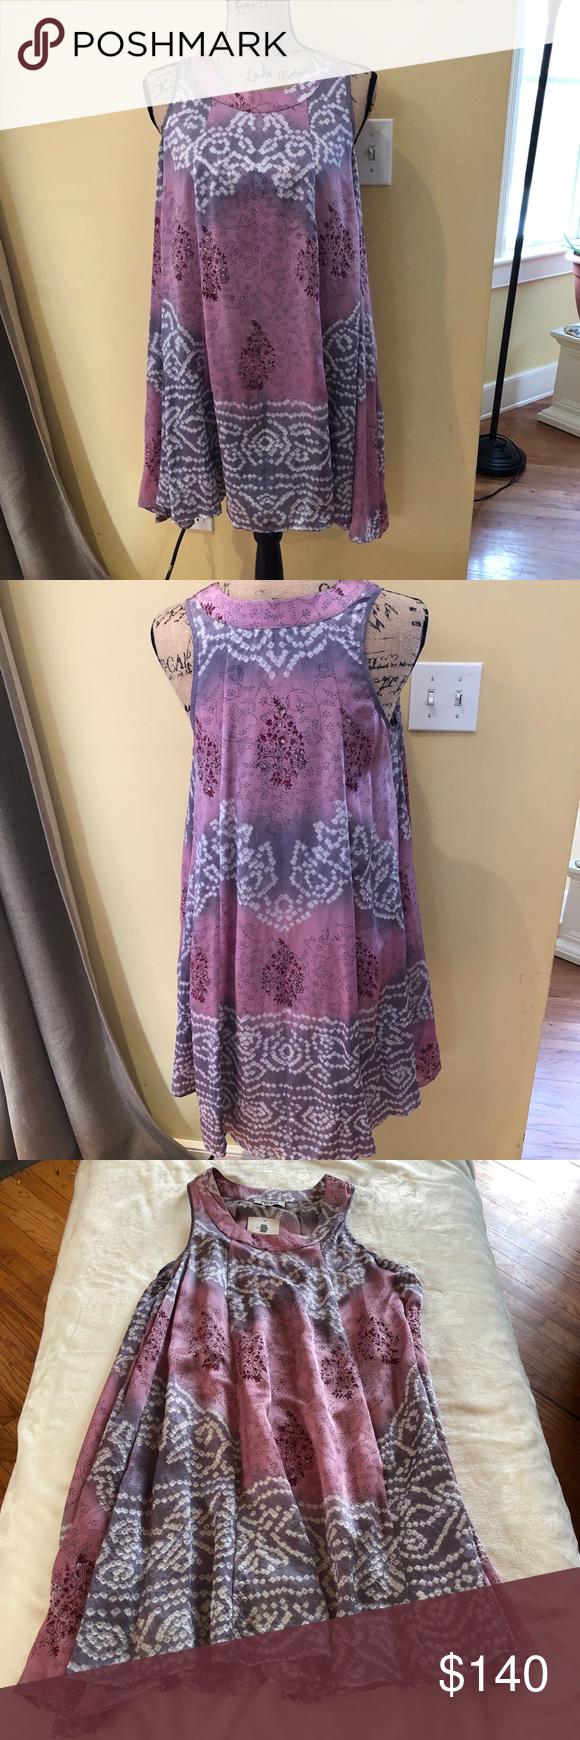 Joshi Karina Dress NWT Dresses, Clothes design